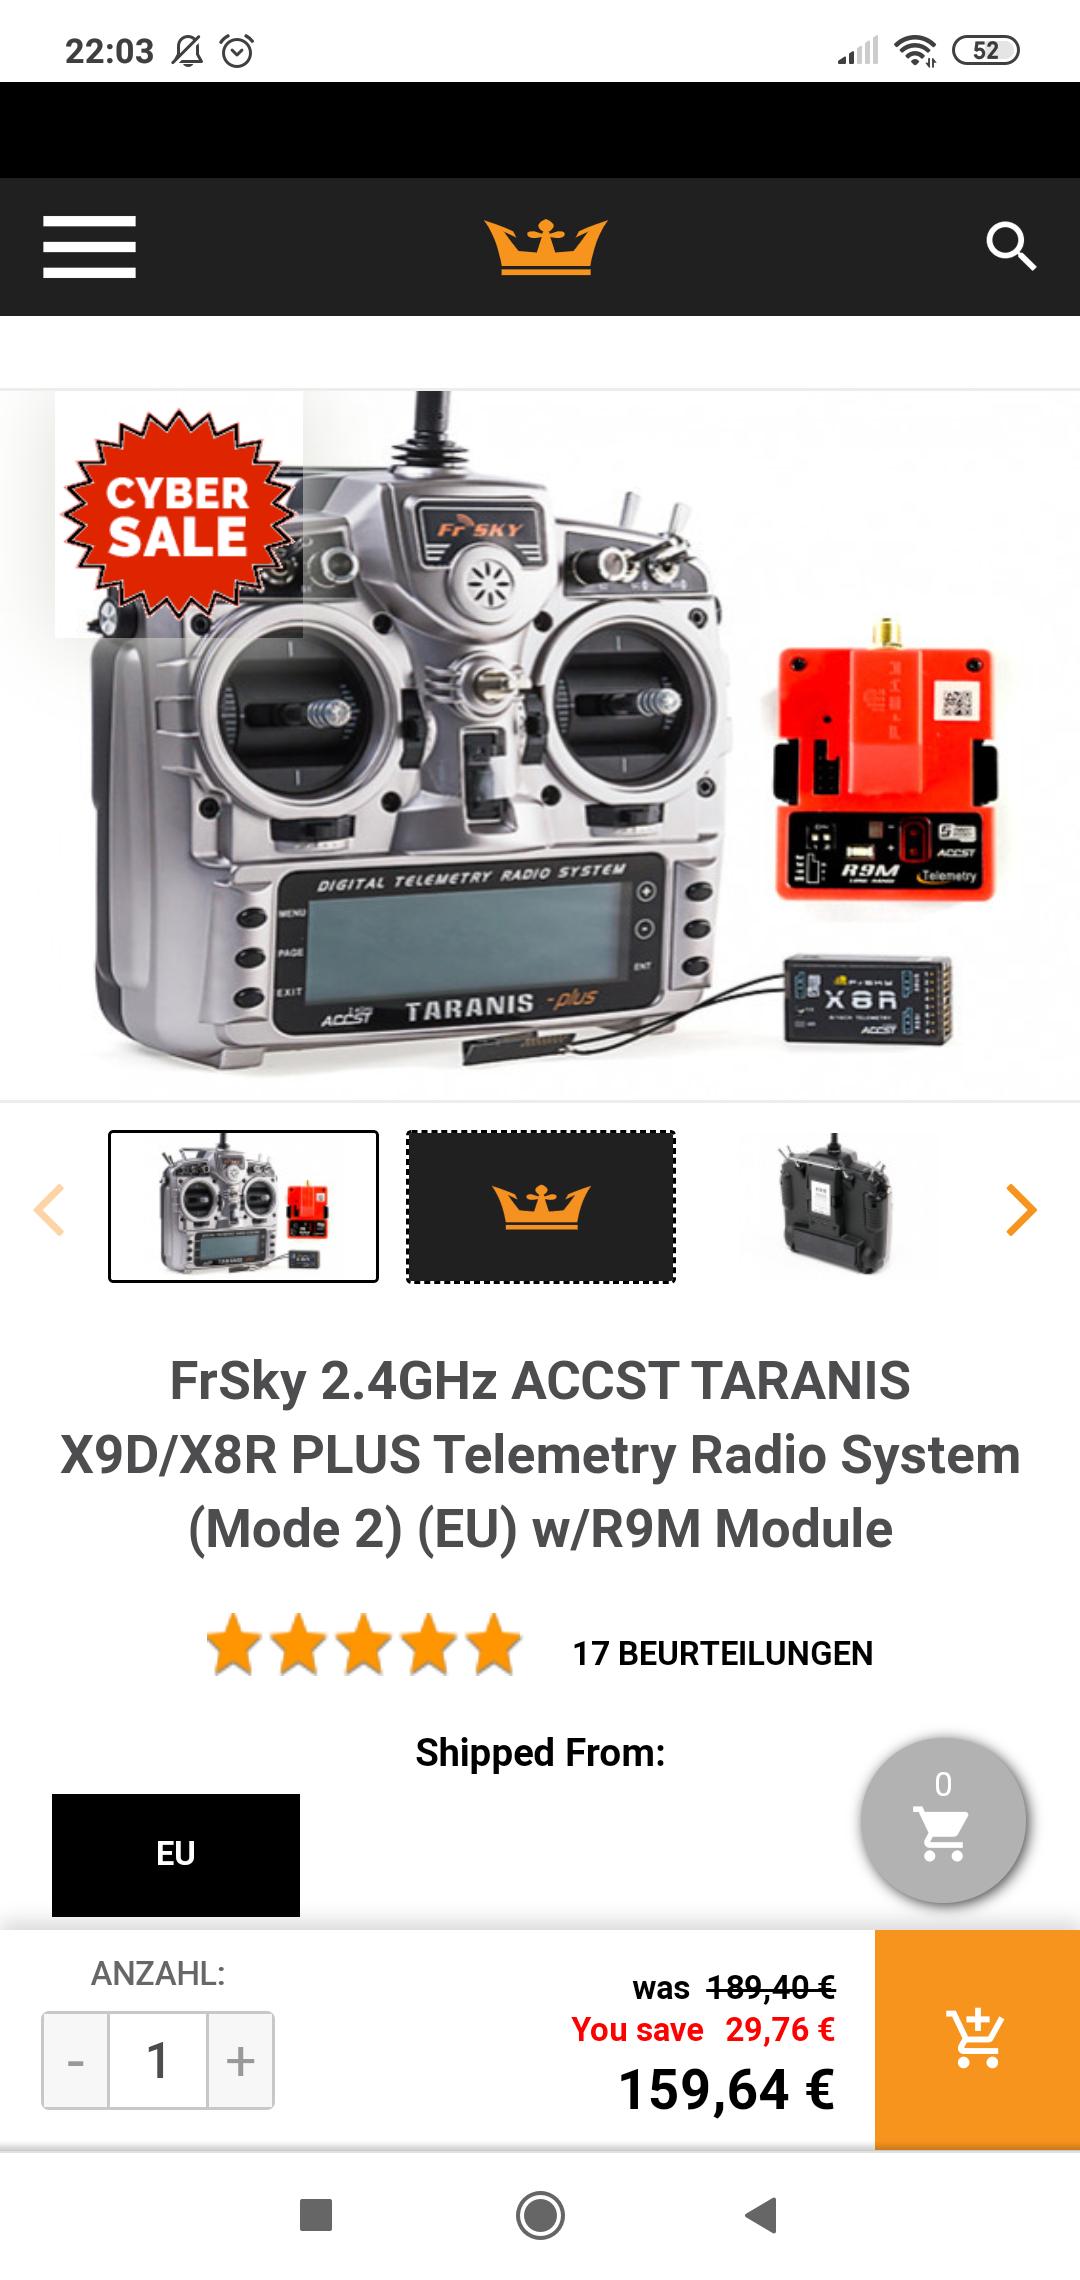 Für alle OpenTX Freaks: FrSky 2.4GHz ACCST TARANIS X9D/X8R PLUS Telemetry Radio System (Mode 2) (EU) w/R9M Module